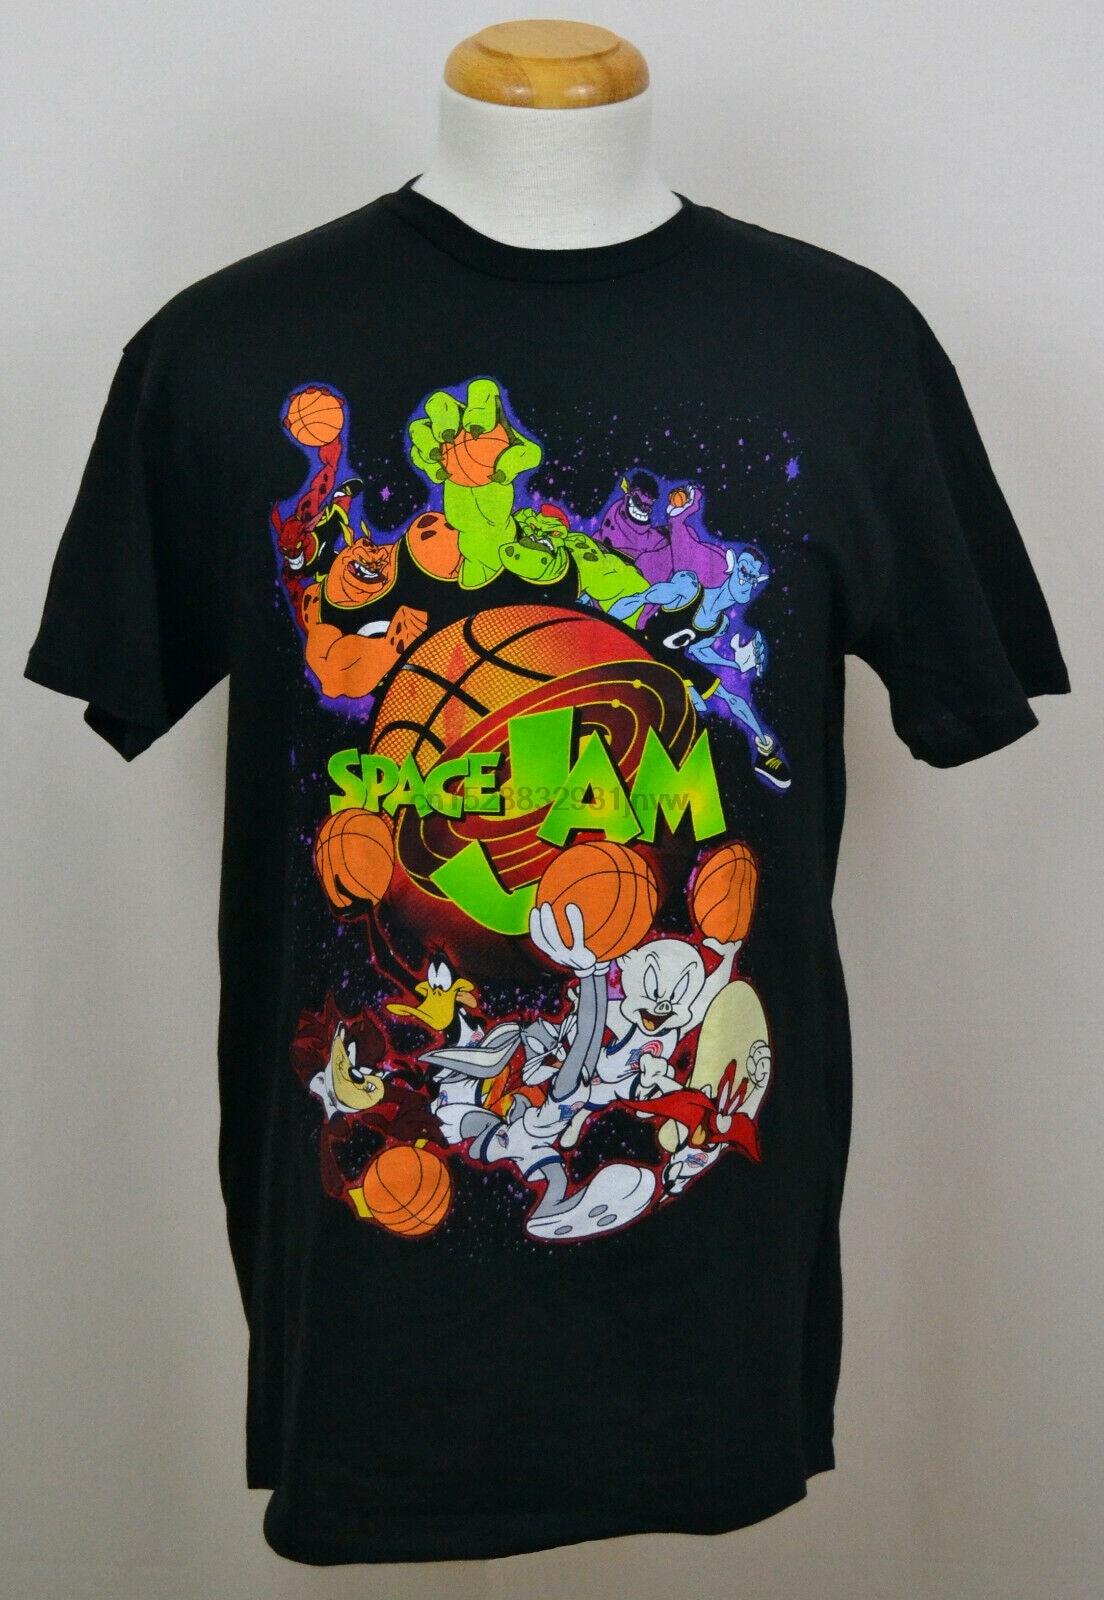 Looney Tunes Space Jam T shirt Tunes vs Monstars Graphic Tee Cotton Black  NWT|T-Shirts